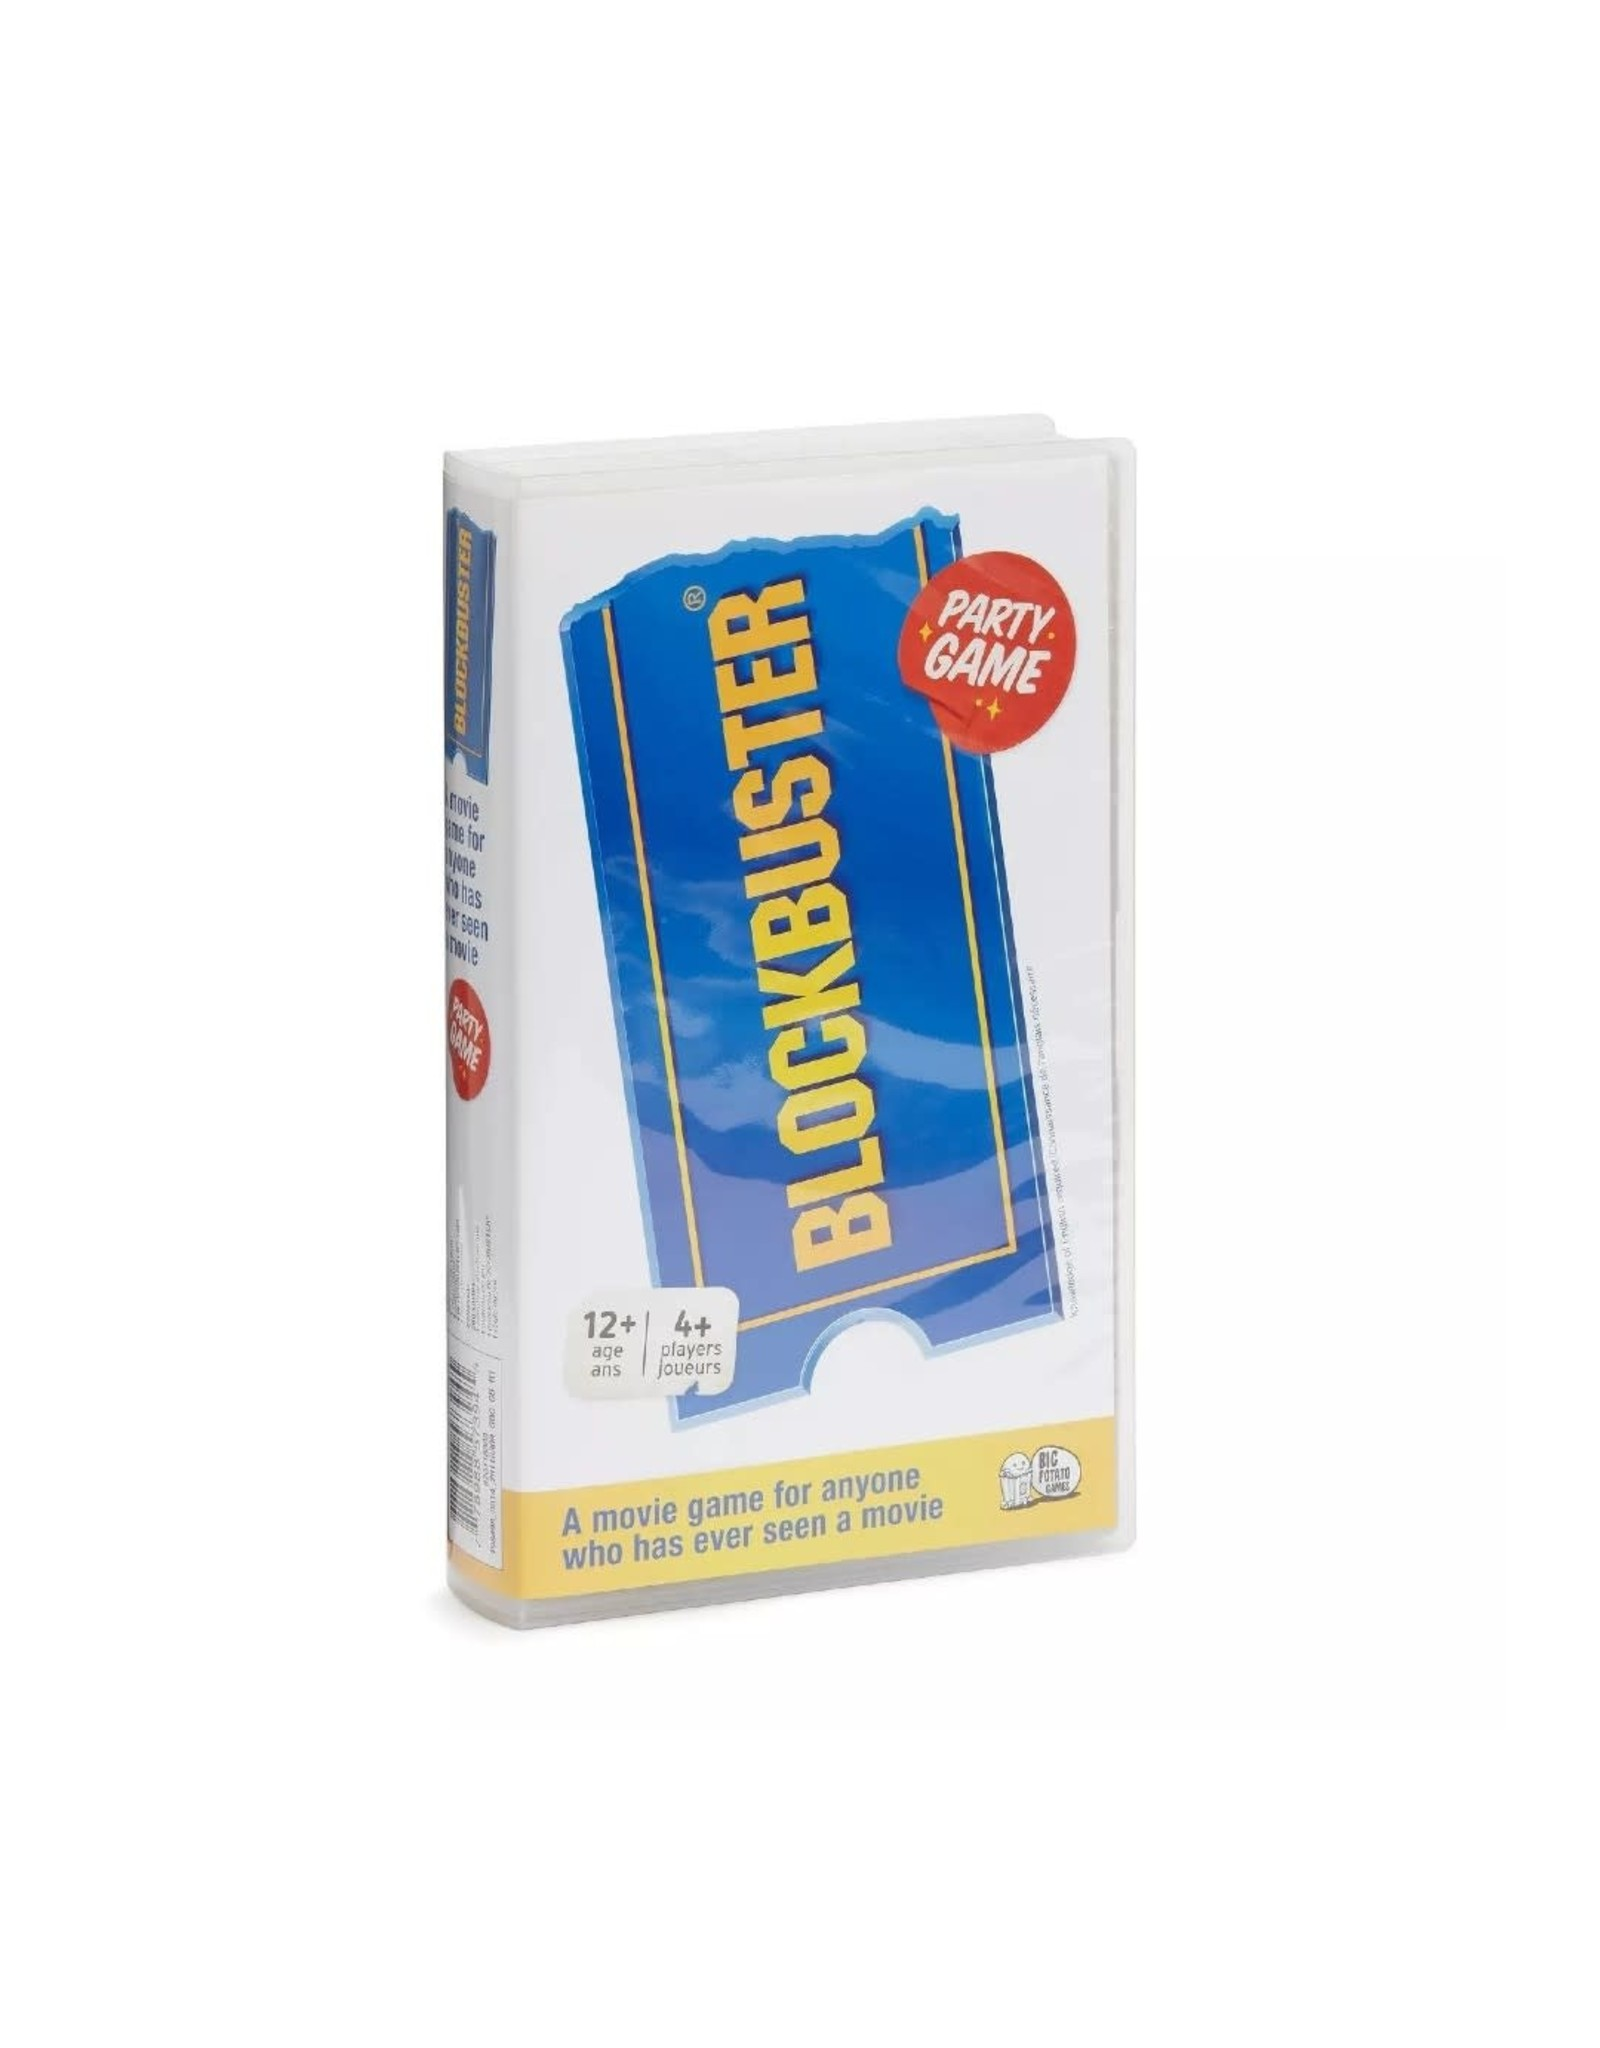 Spinmaster Blockbuster Game